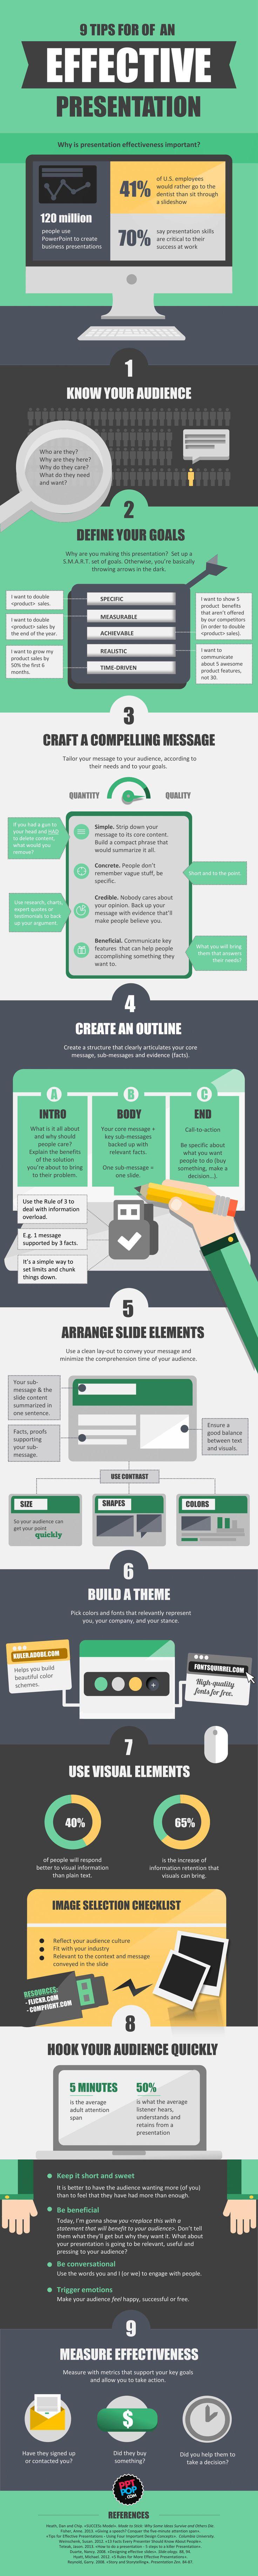 Infographic: Nine Tips For An Effective Presentation - DesignTAXI.com